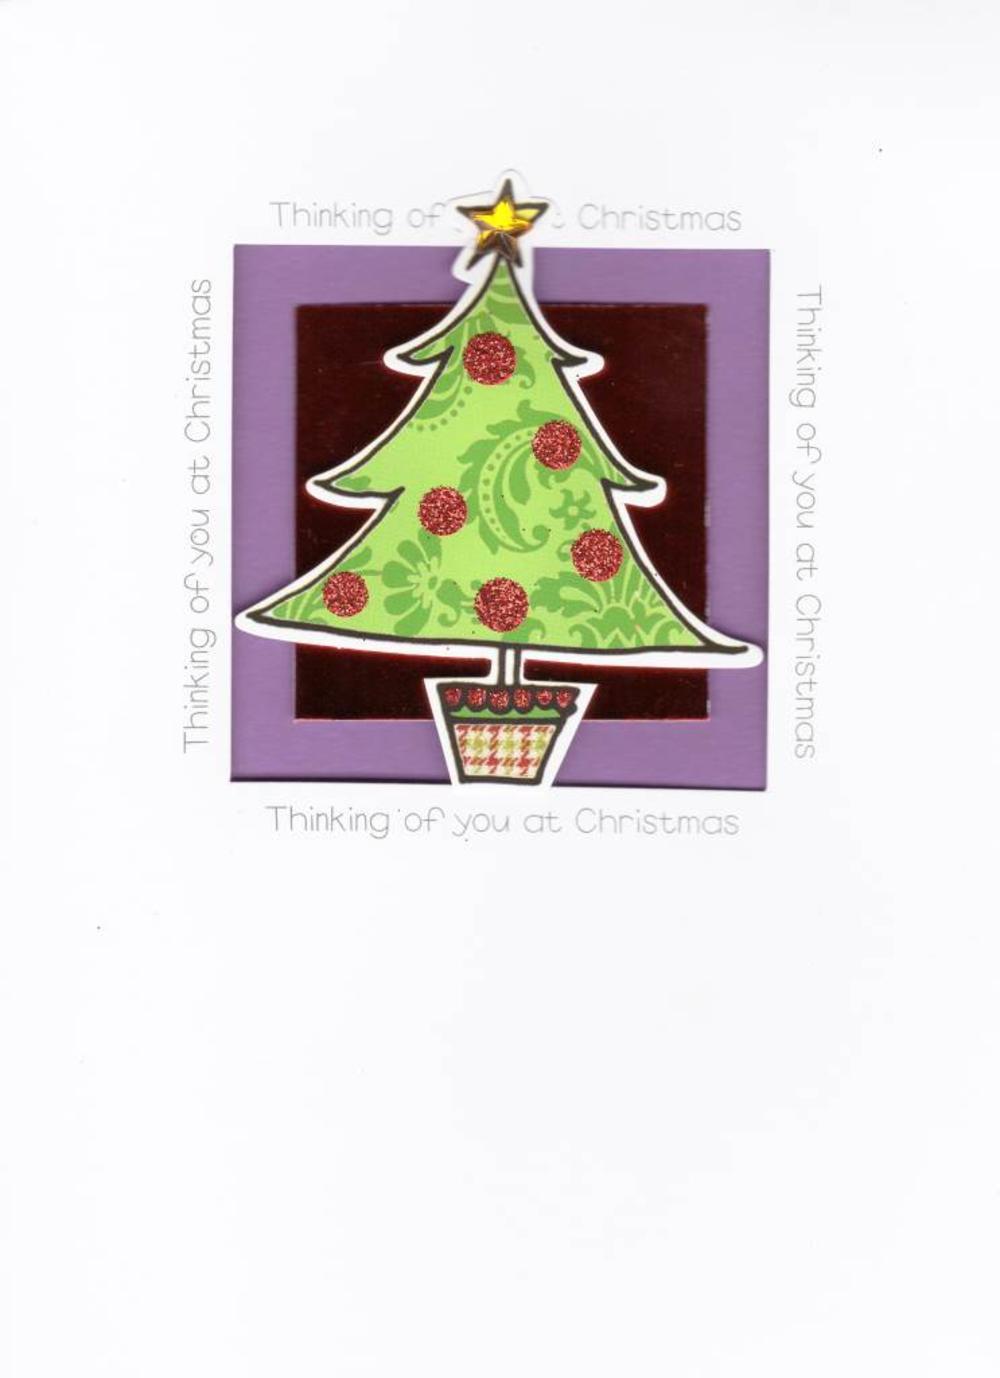 Luxury 3D Handmade Xmas Cards Christmas Tree Card Shop Buy Bulk Make offer